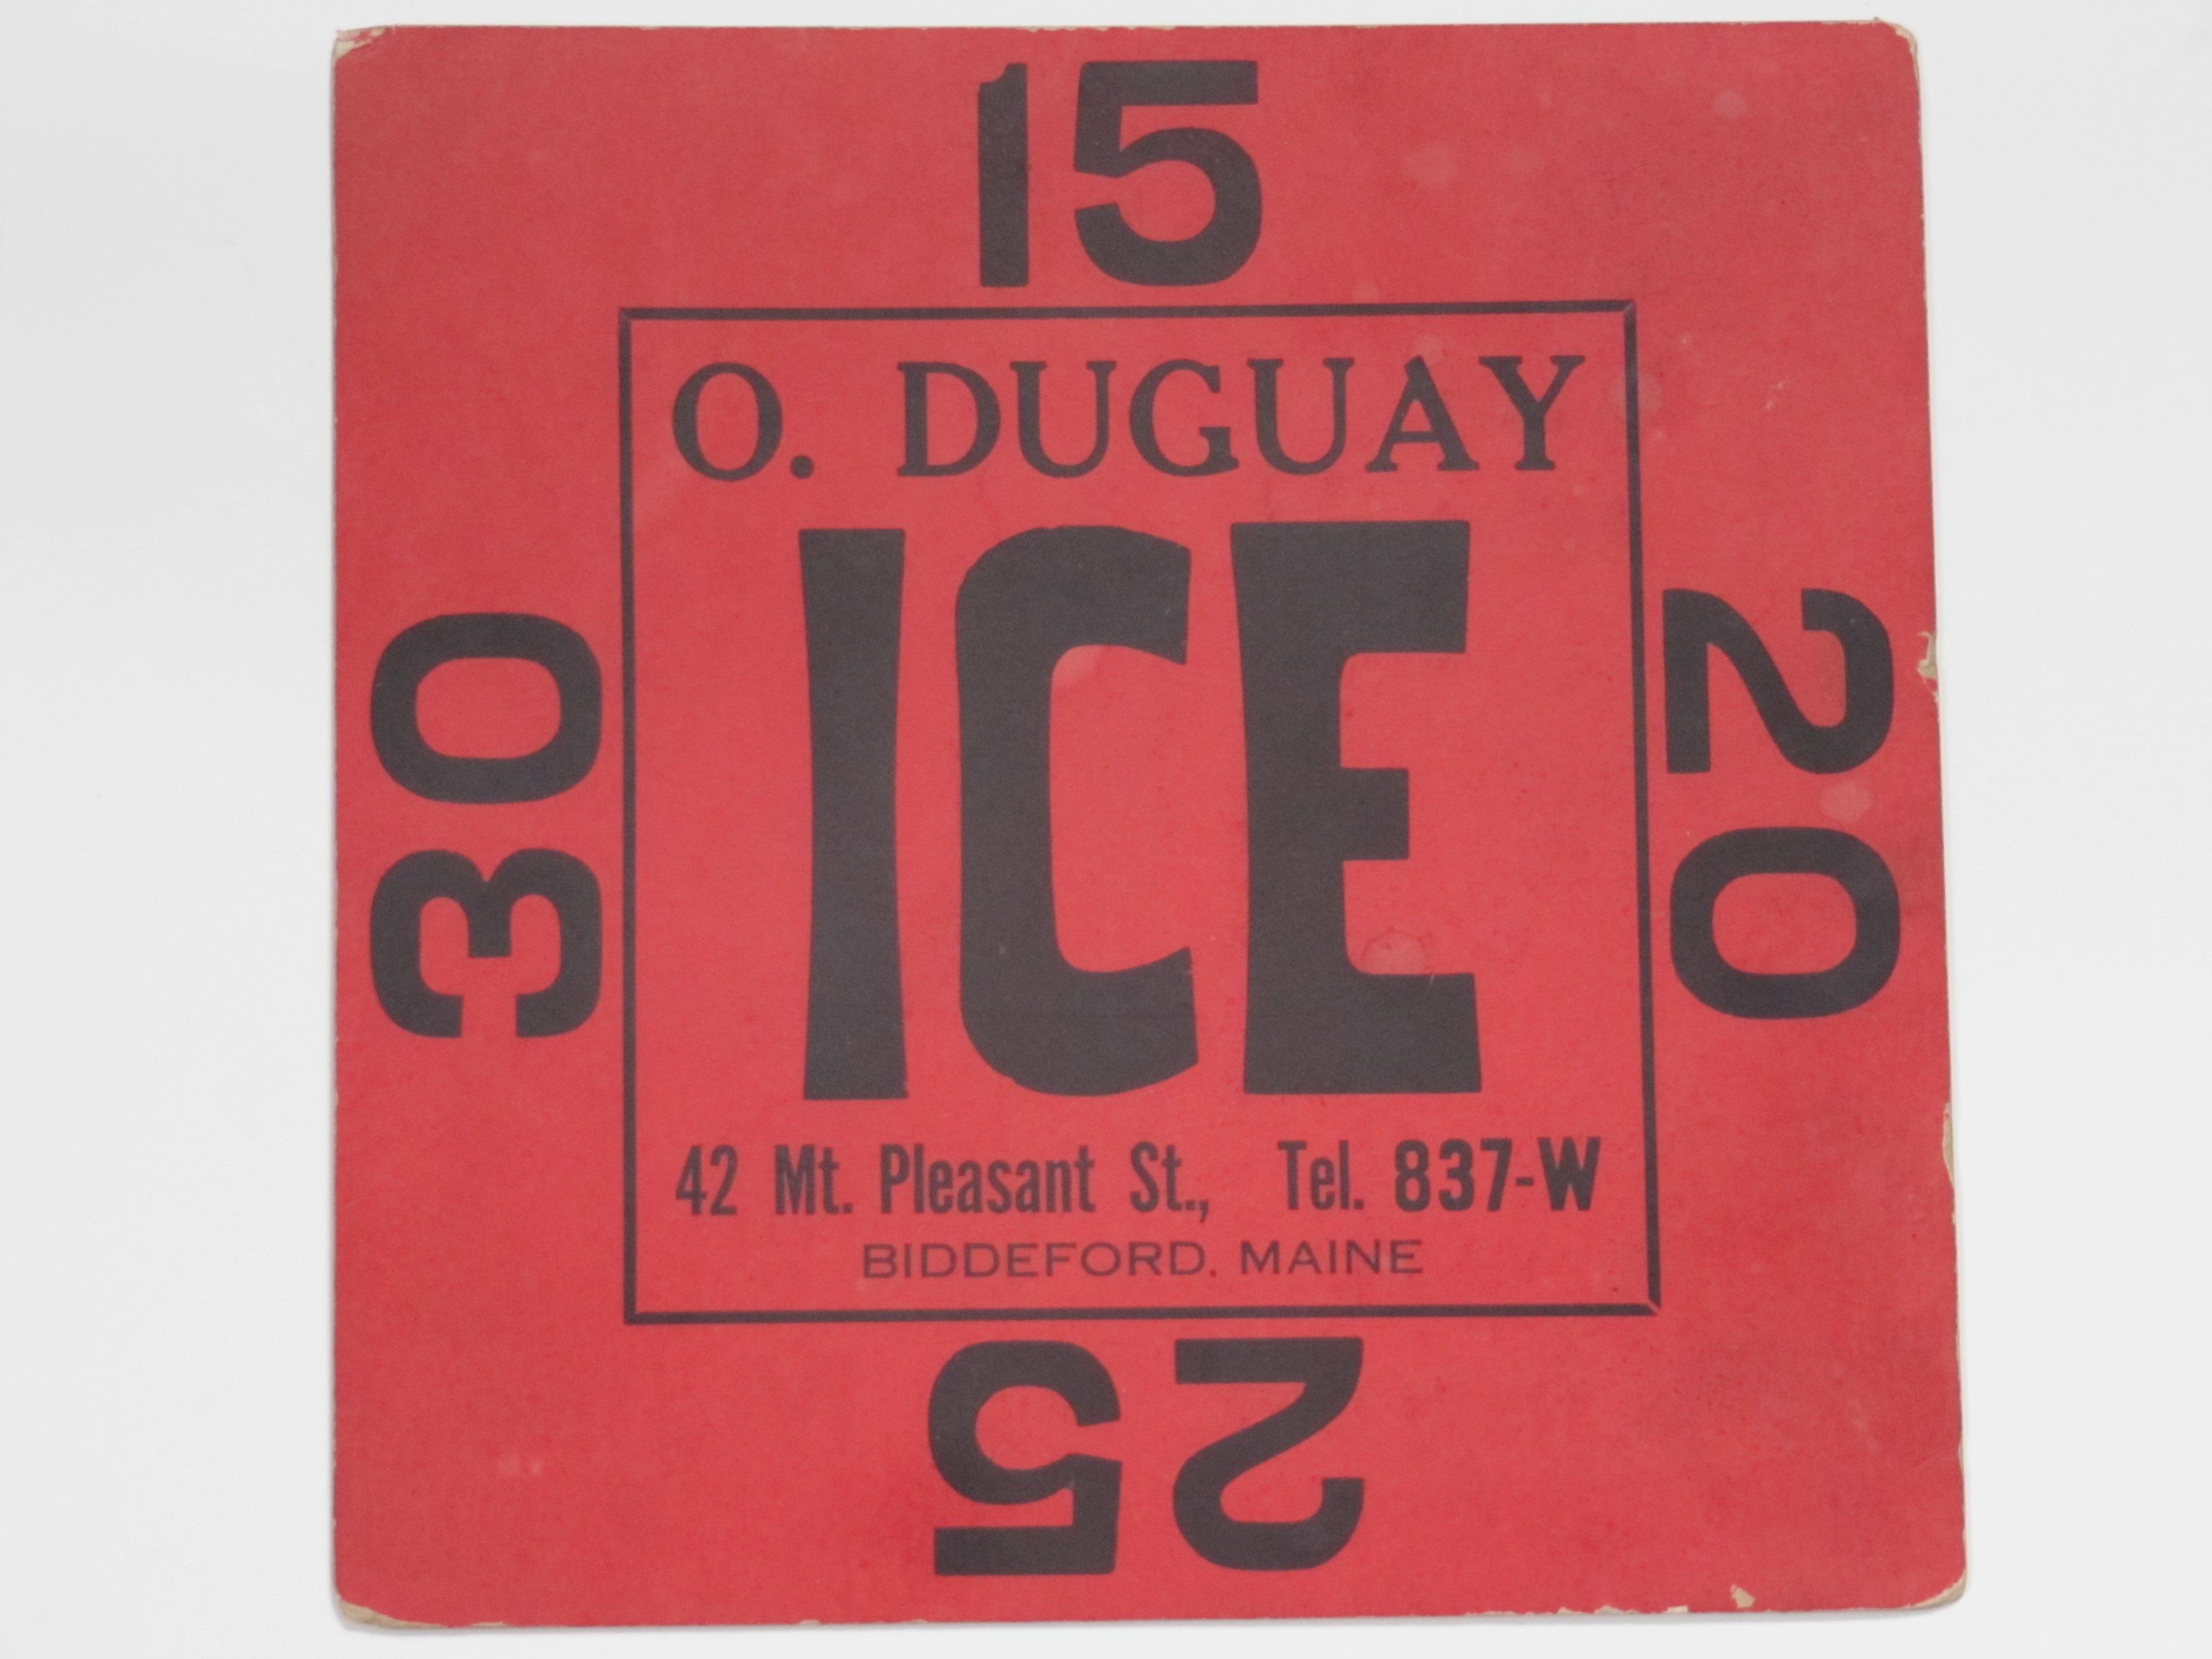 O.Duguay Ice